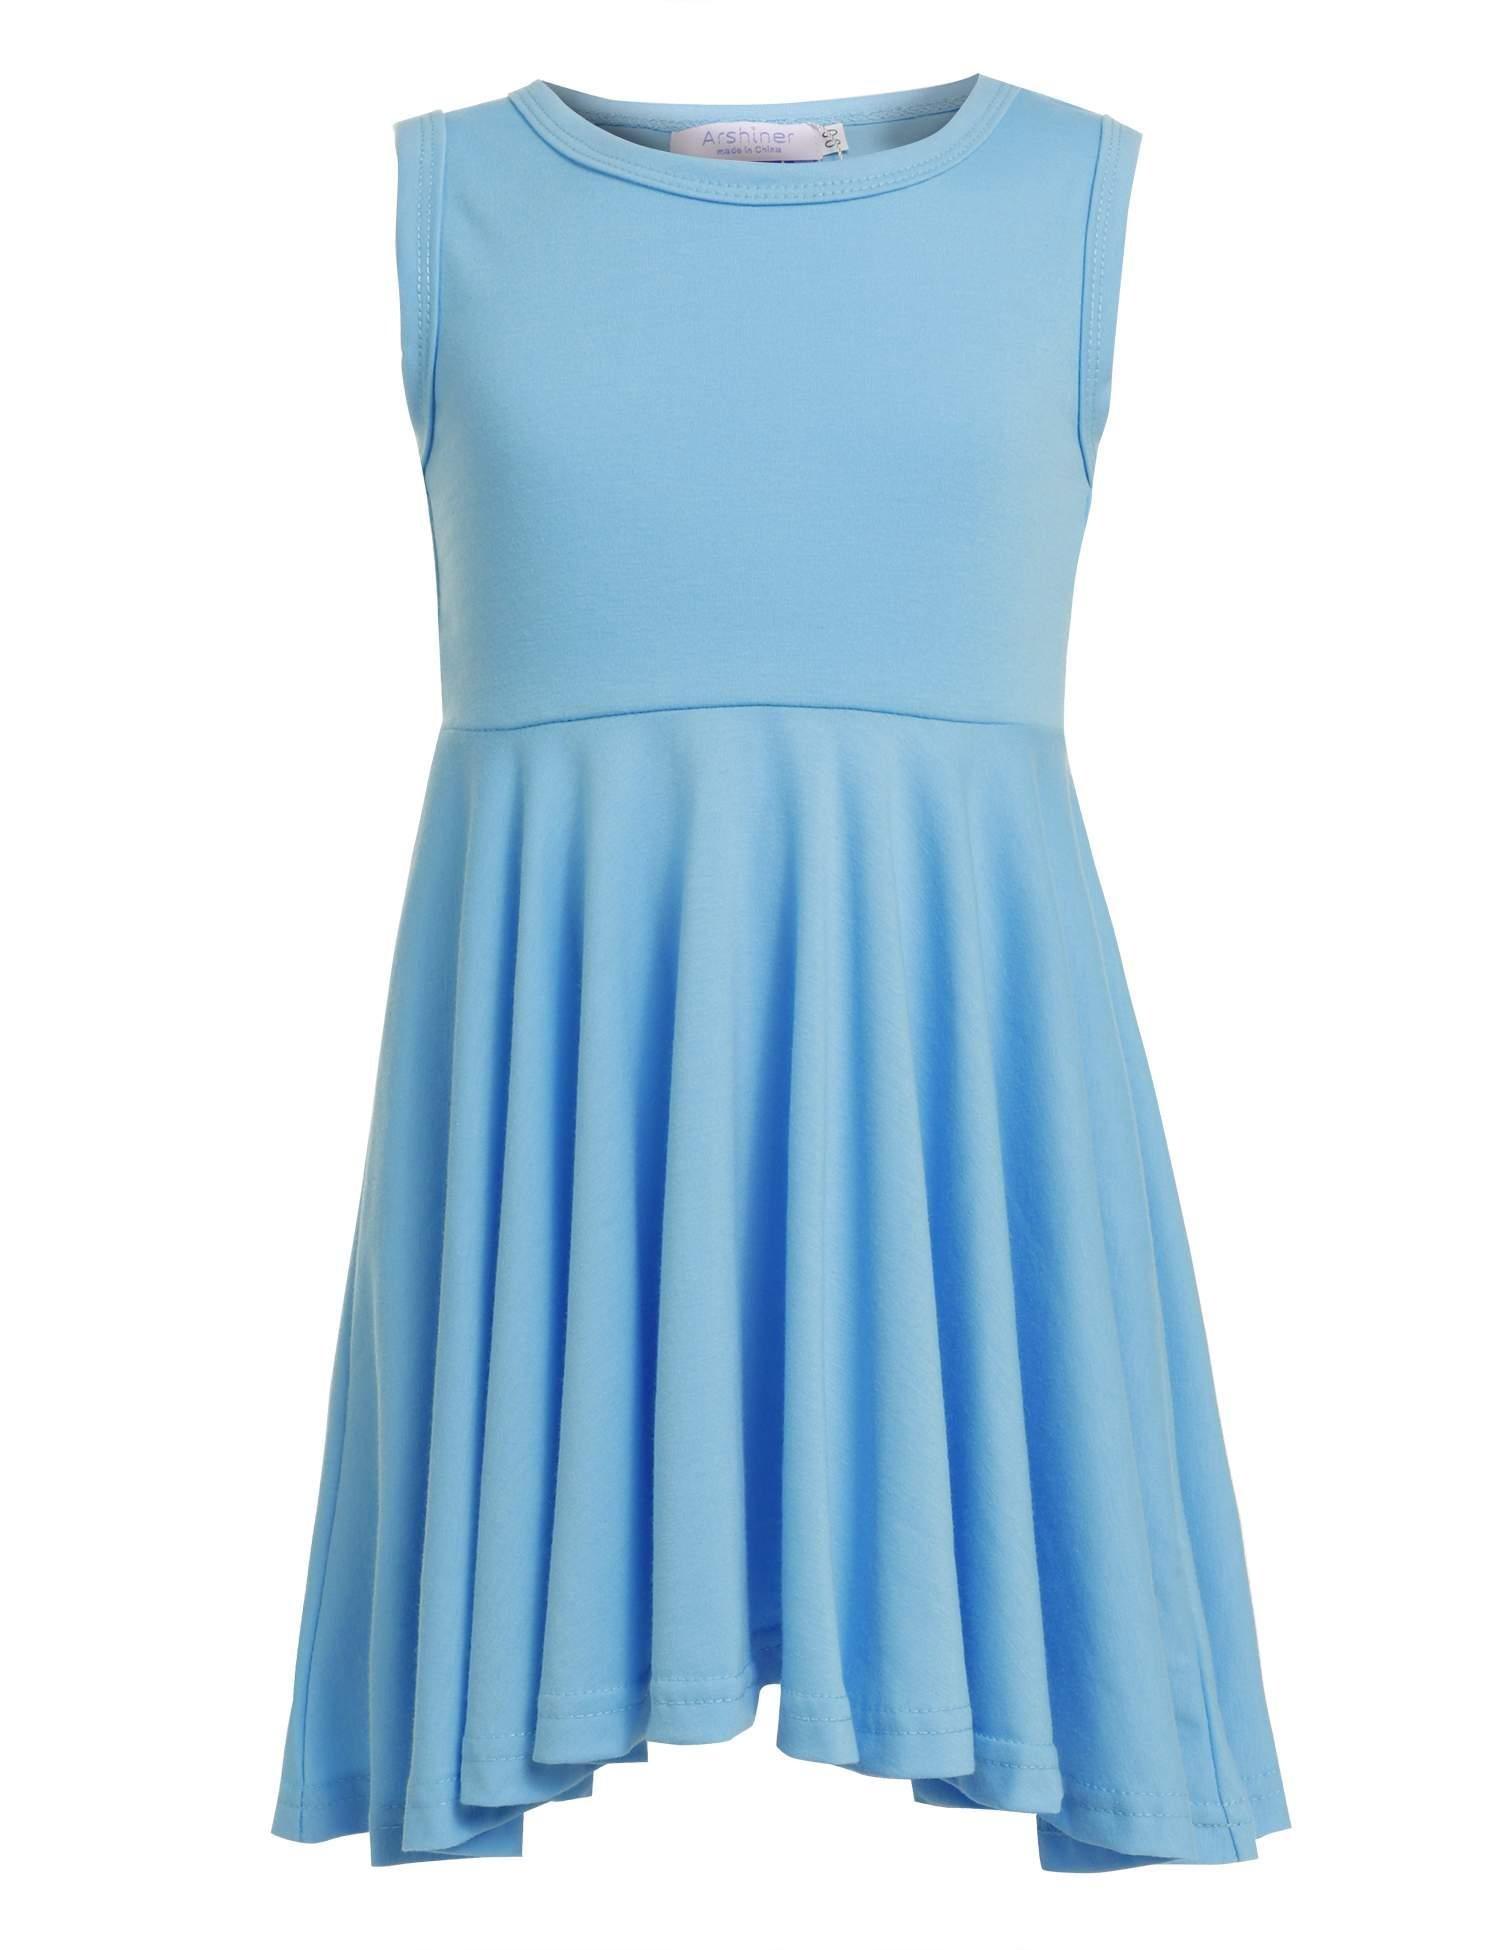 balasha Girls O-Neck Solid Color A-line Ruffled Sleeveless Summer Dress